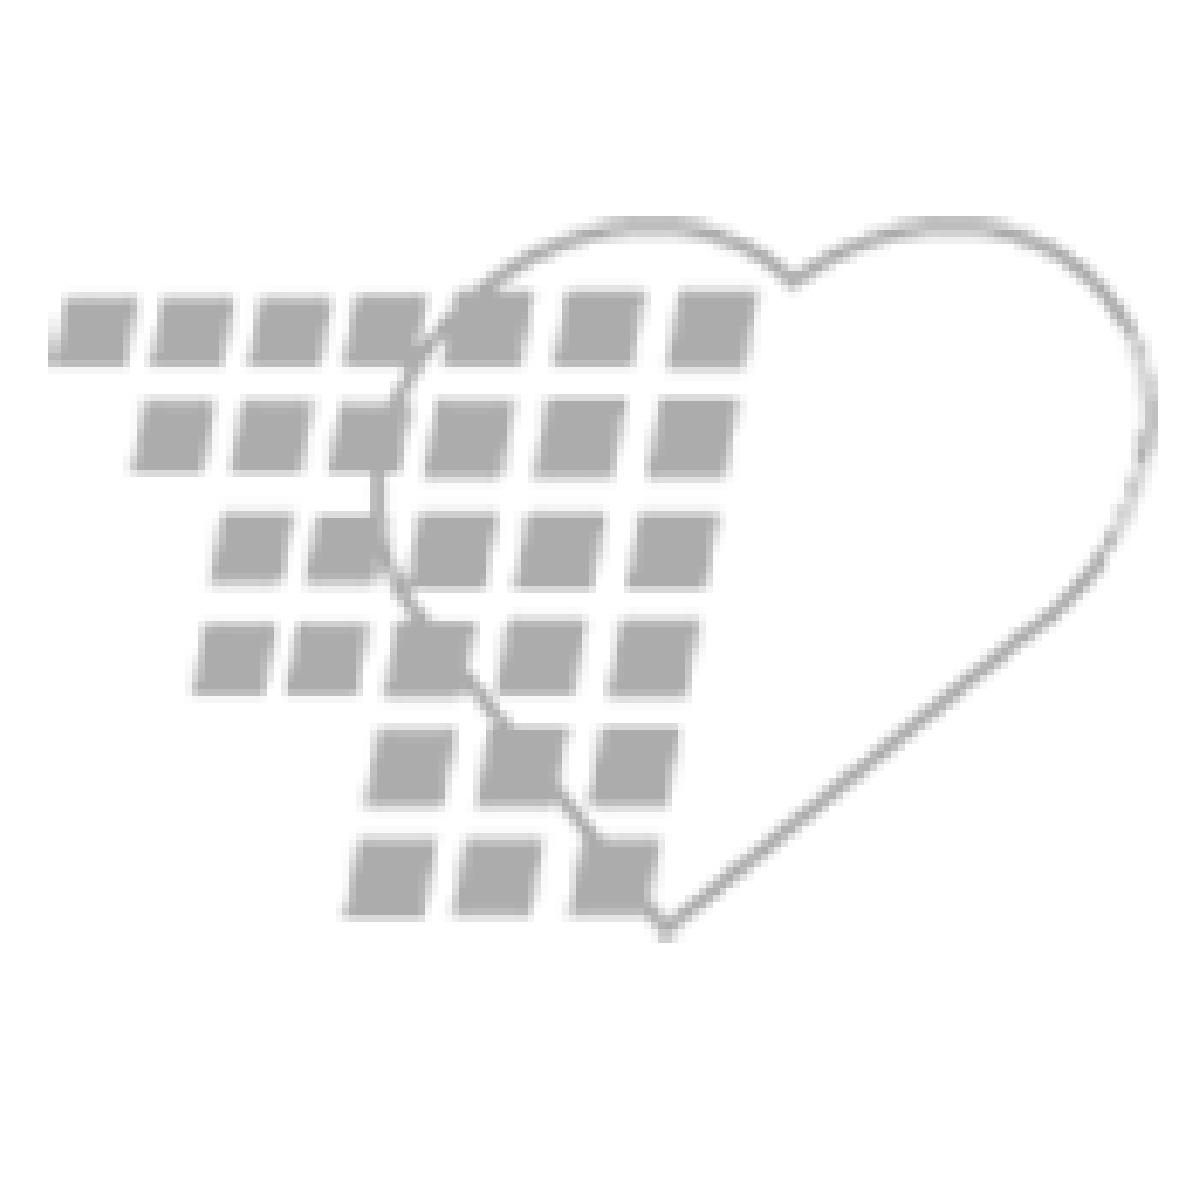 08-82-4521 Suture Removal Kit (Sterile)